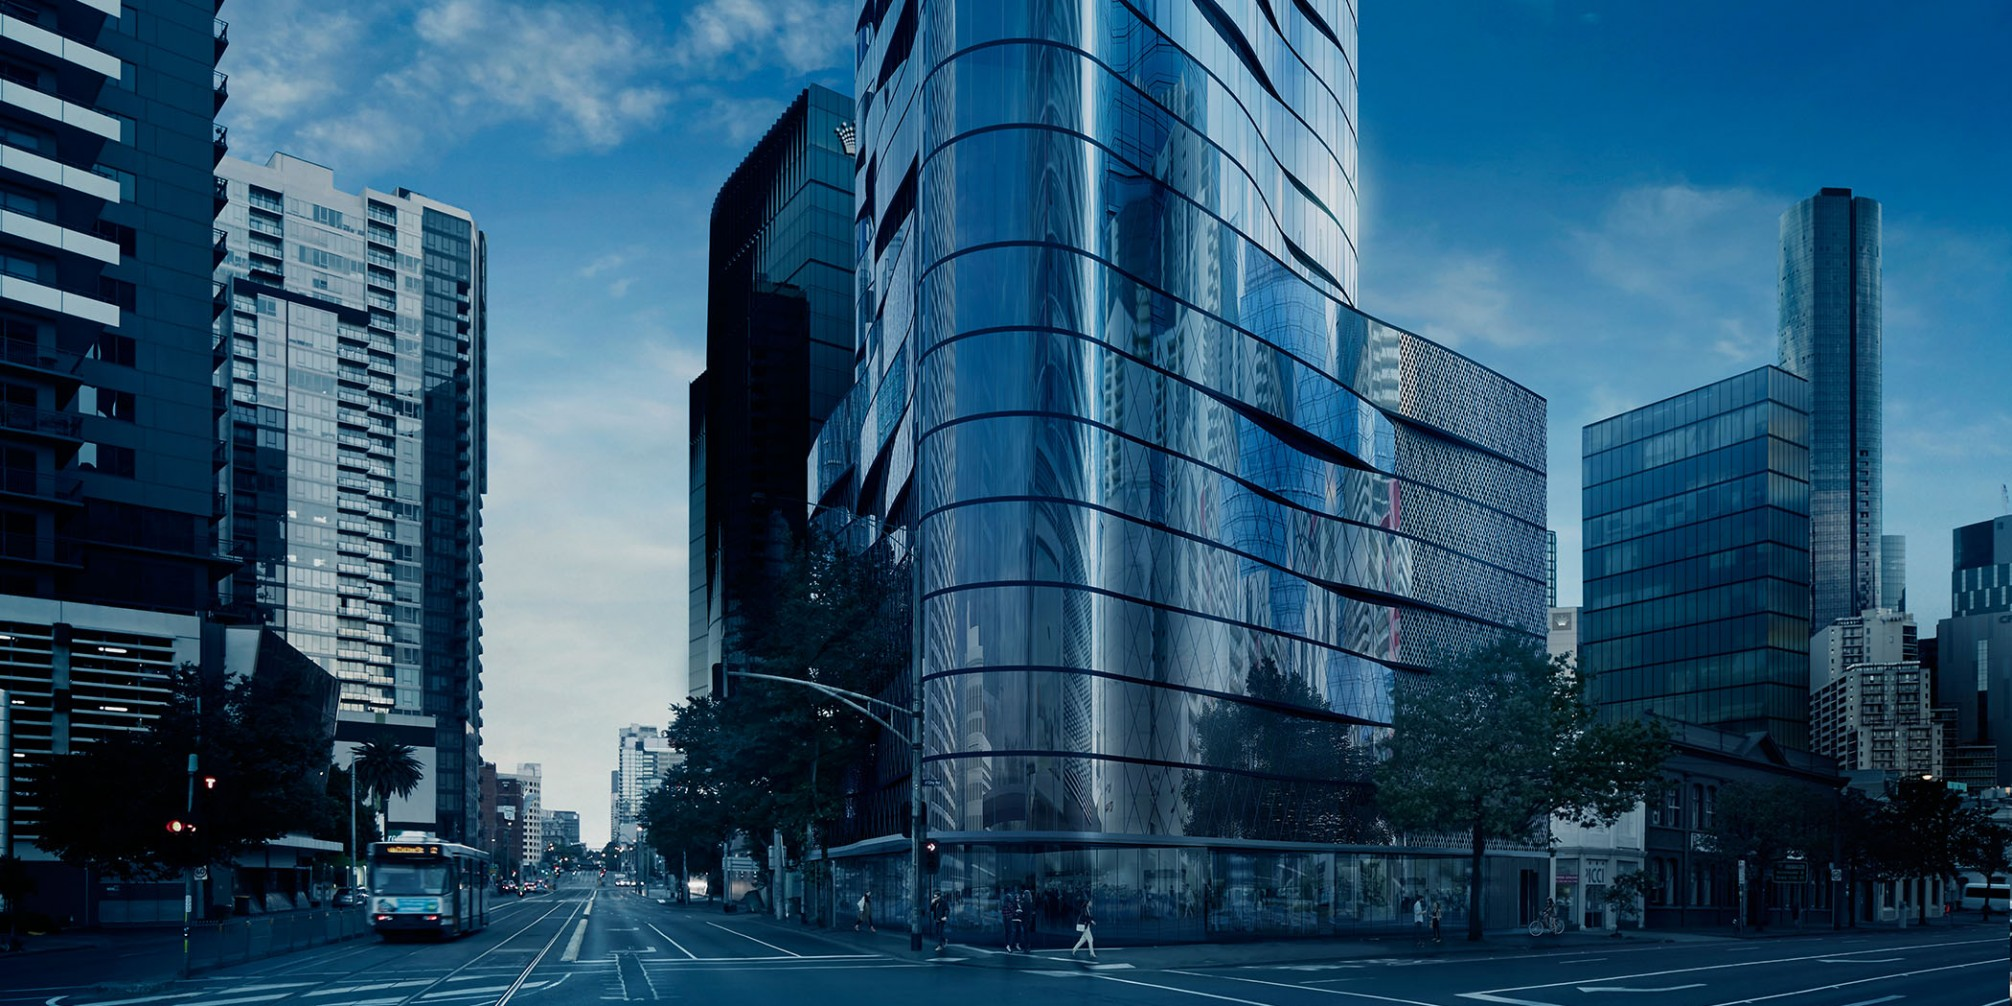 BPM公司 公司 BPM 物业 开发 管理 建筑 JONATHAN HALLINAN 投资 墨尔本 布里斯班_房地产(REAL ESTATE) 公寓咨询 期房(OFF PLAN) 精品_项目